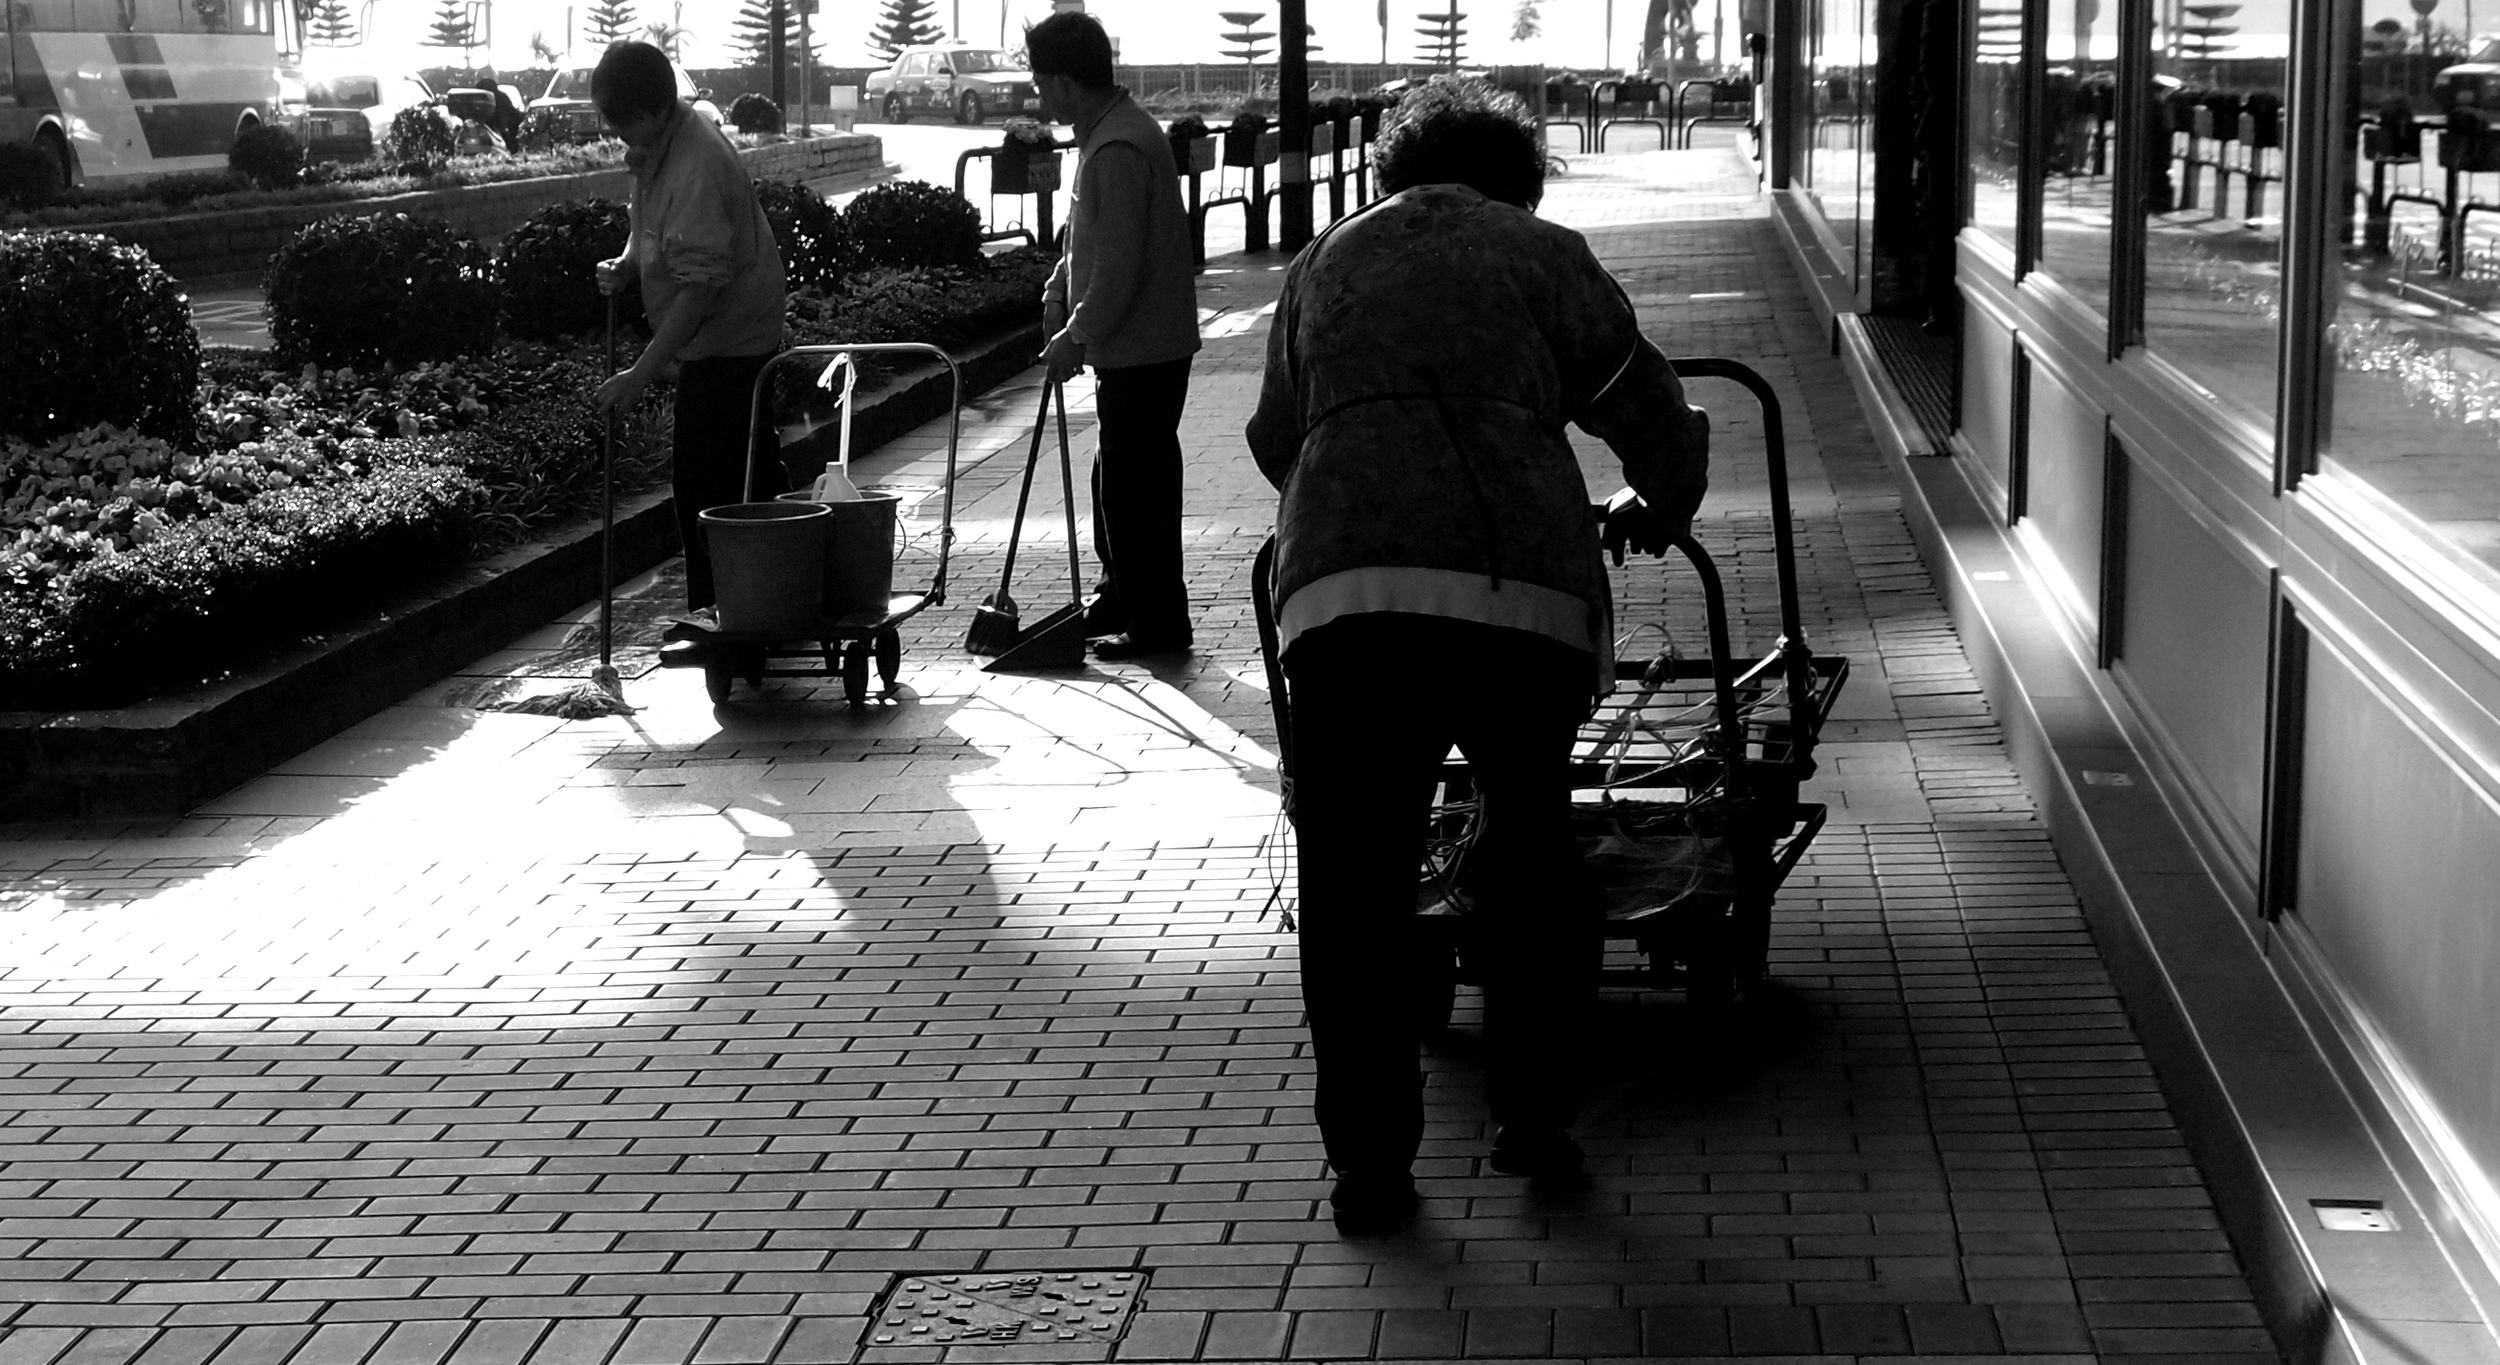 My nemesis - the killer trolley